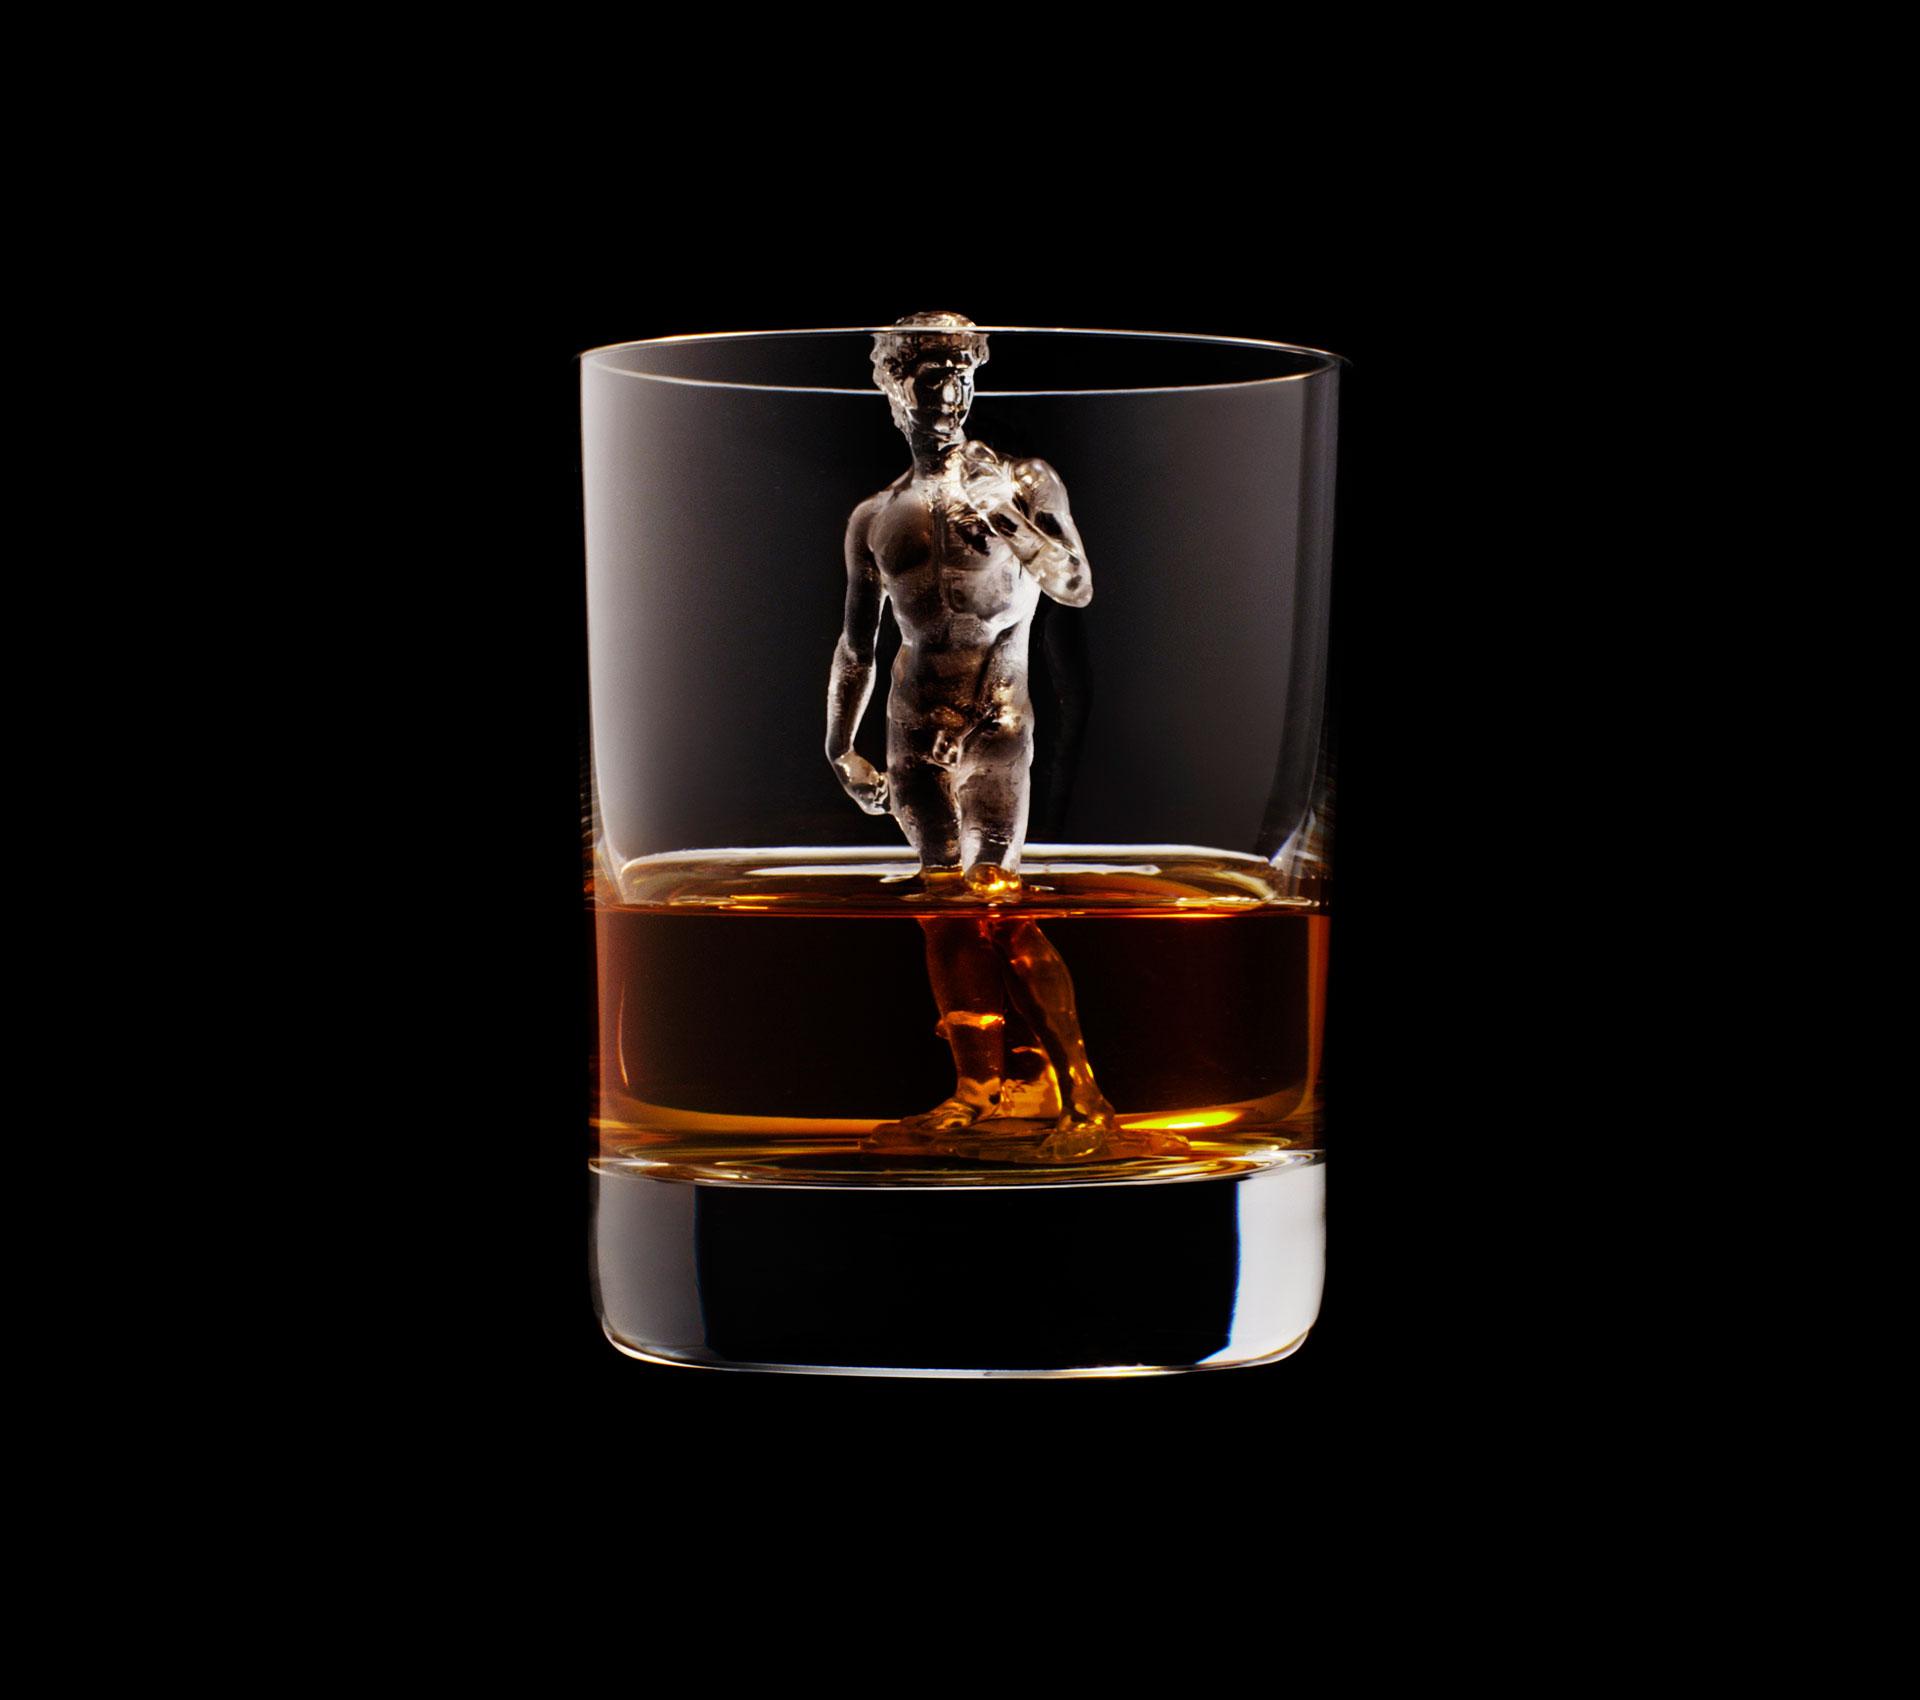 dans-ta-pub-whisky-tbwa-suntory-ice-cubes-21